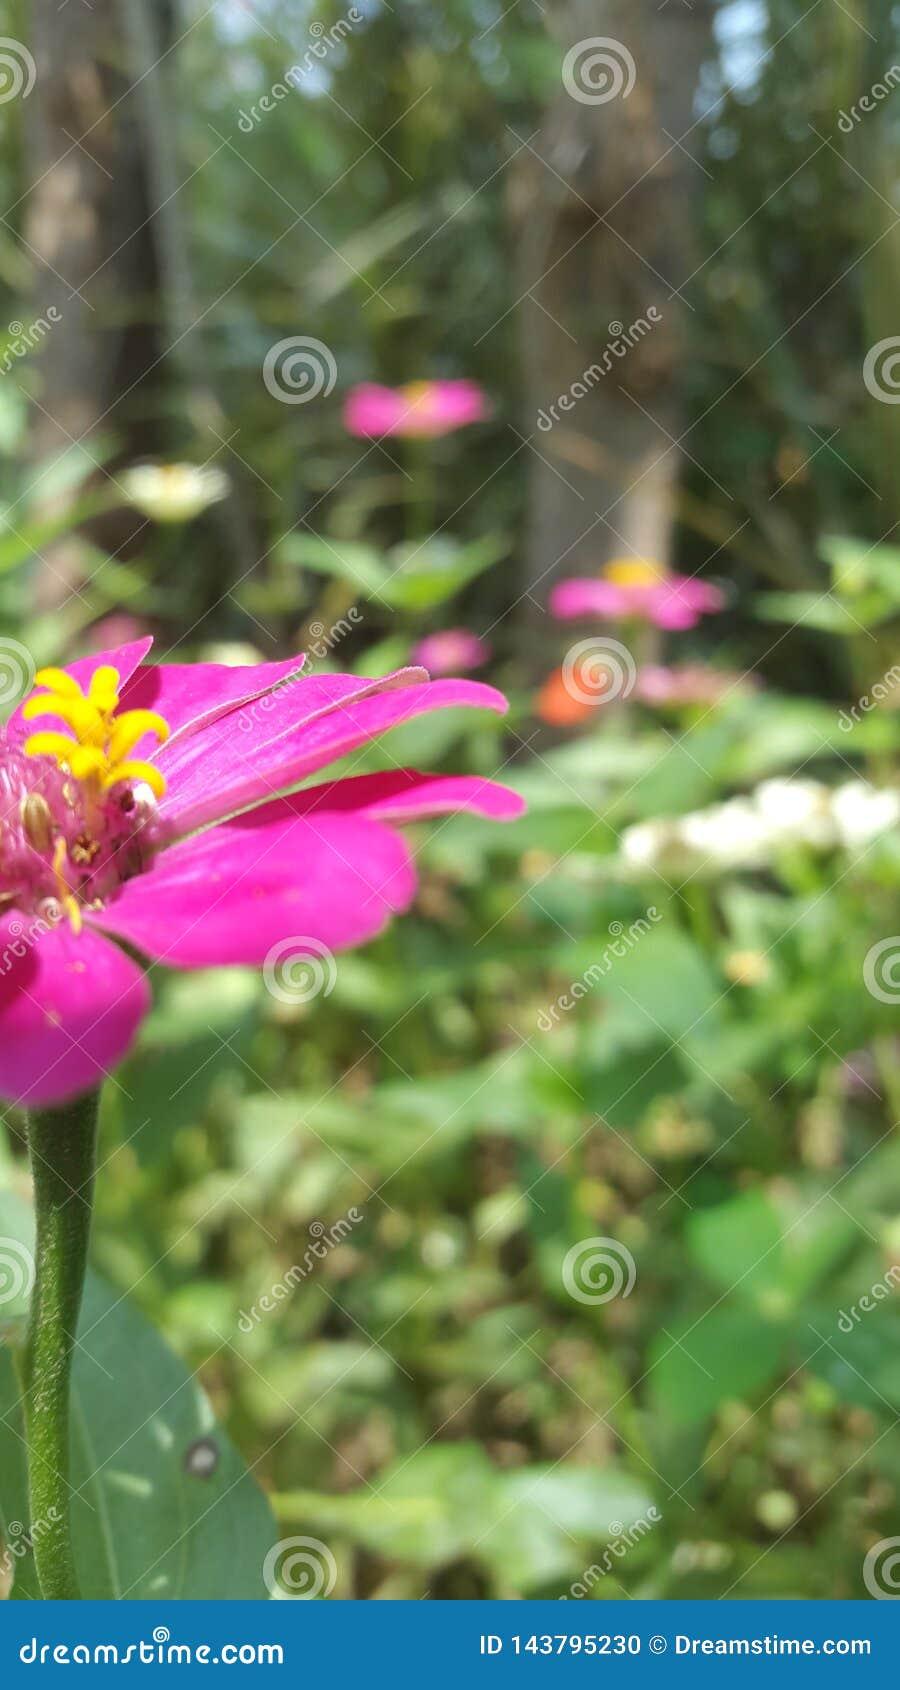 Natural Decoration of Flowers gives rest to eyelids & mind